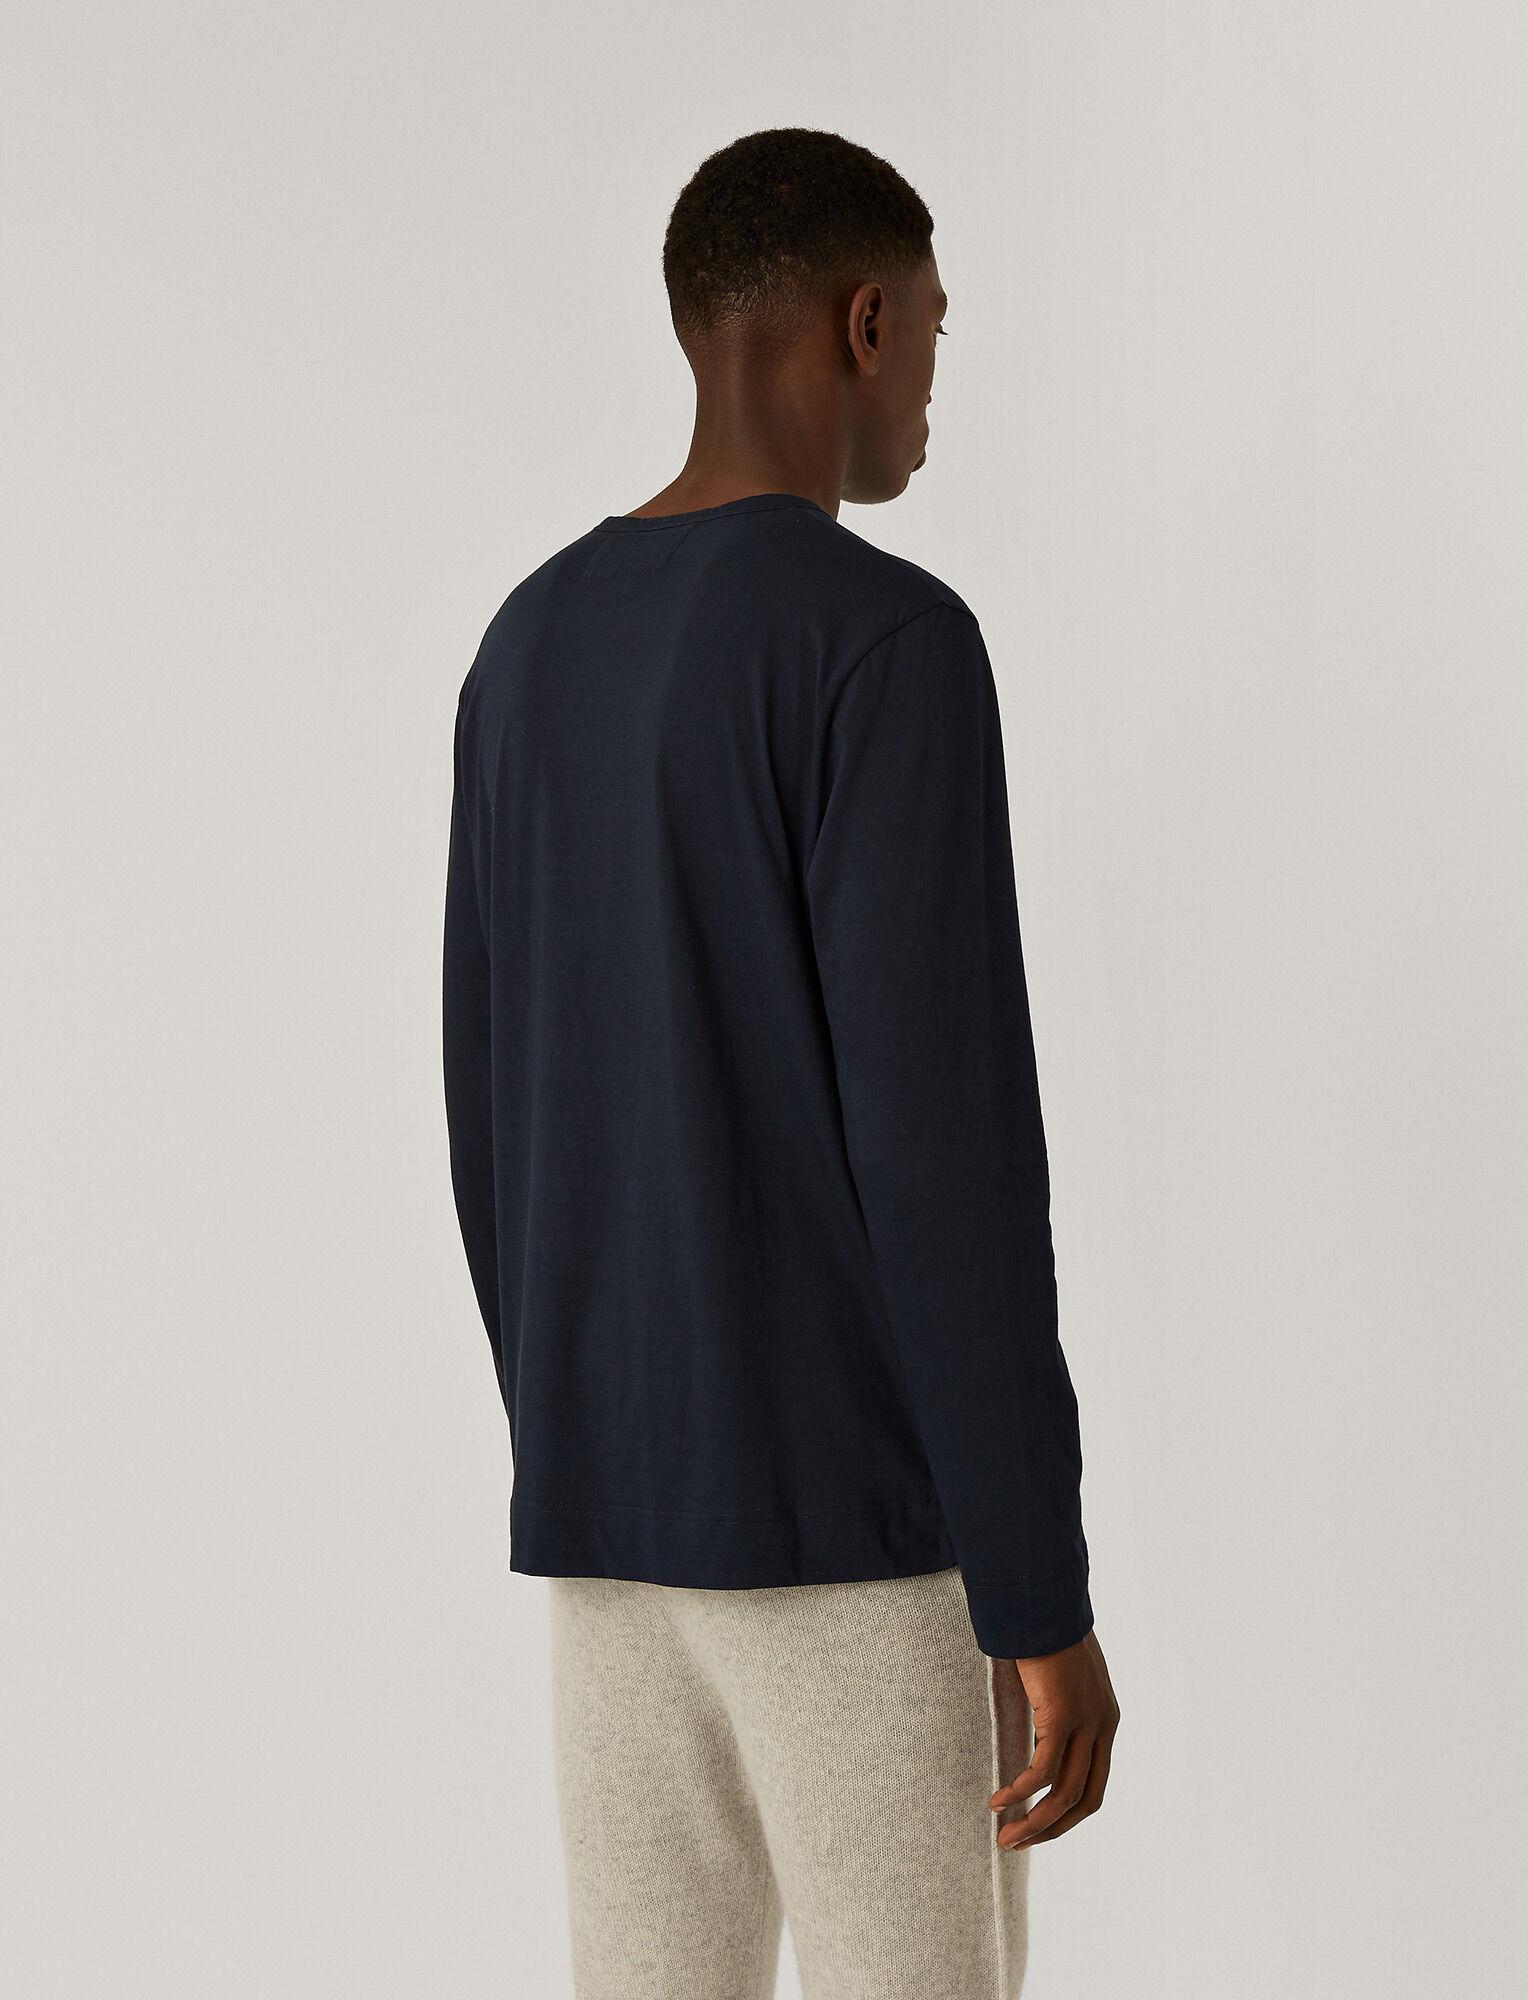 Joseph, Tee-shirt col rond en jersey de lyocell, in NAVY